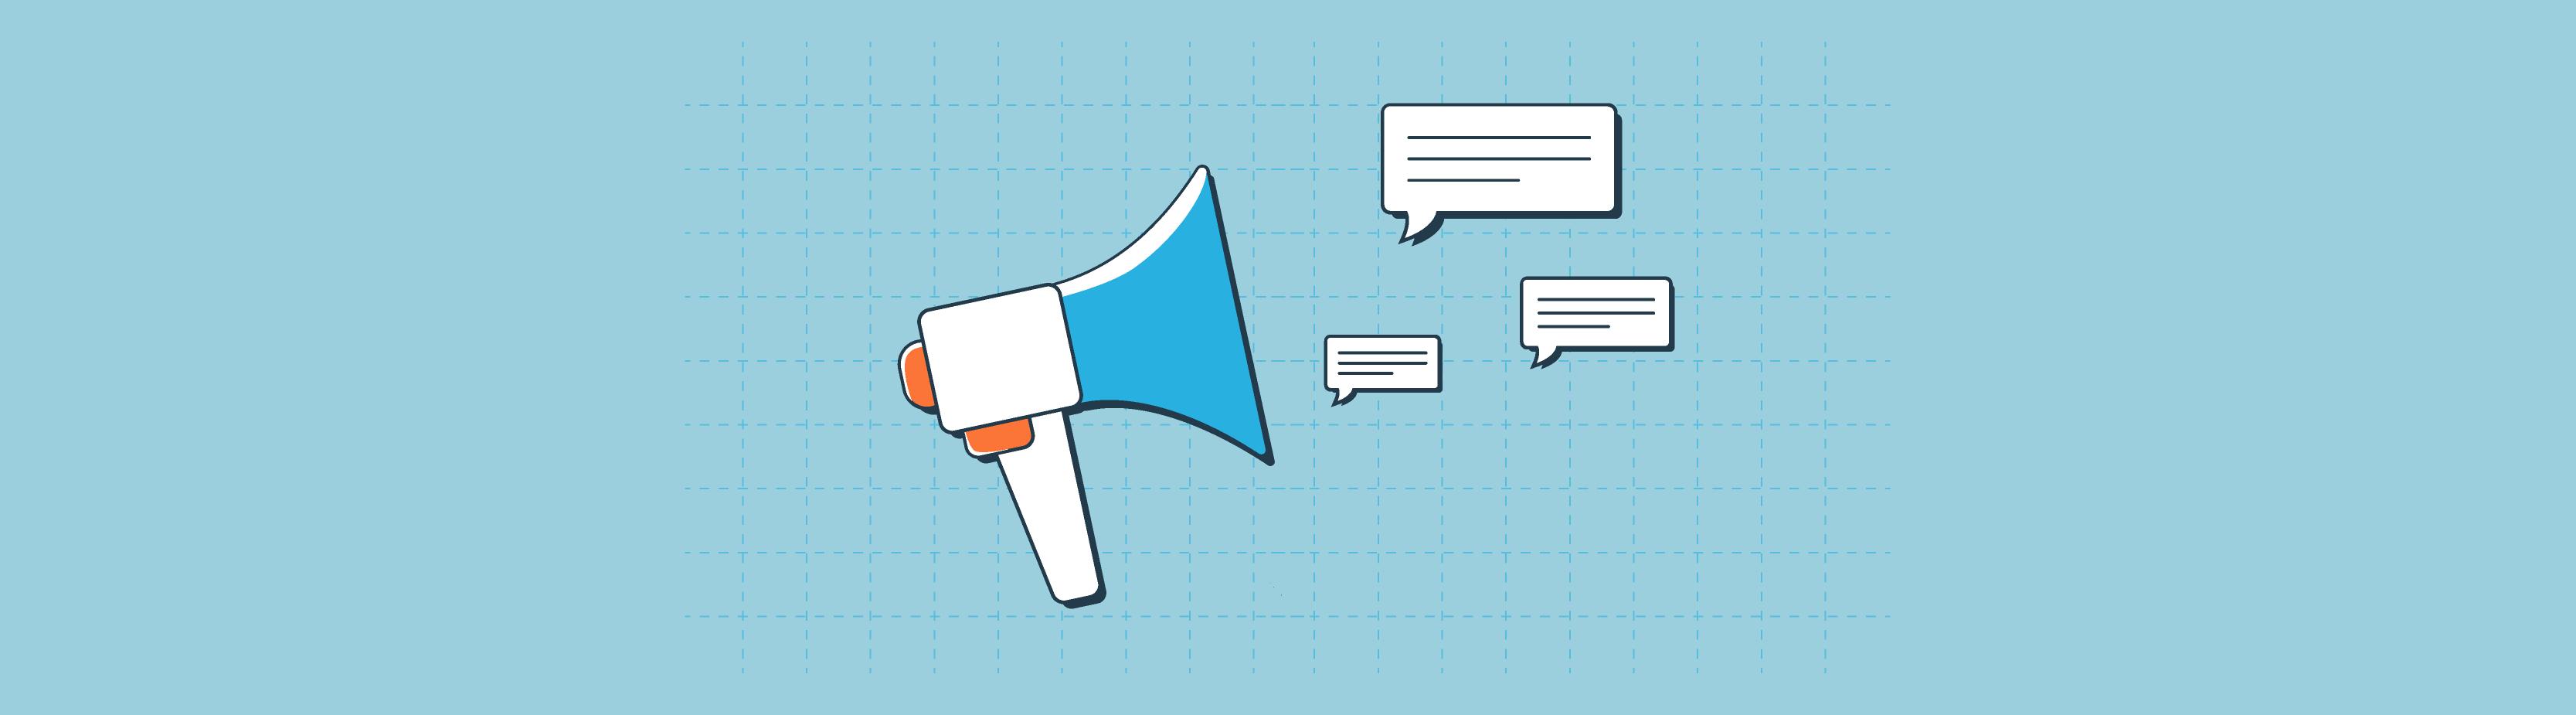 SMS-kommunikation – derfor skal du kommunikere skarpt